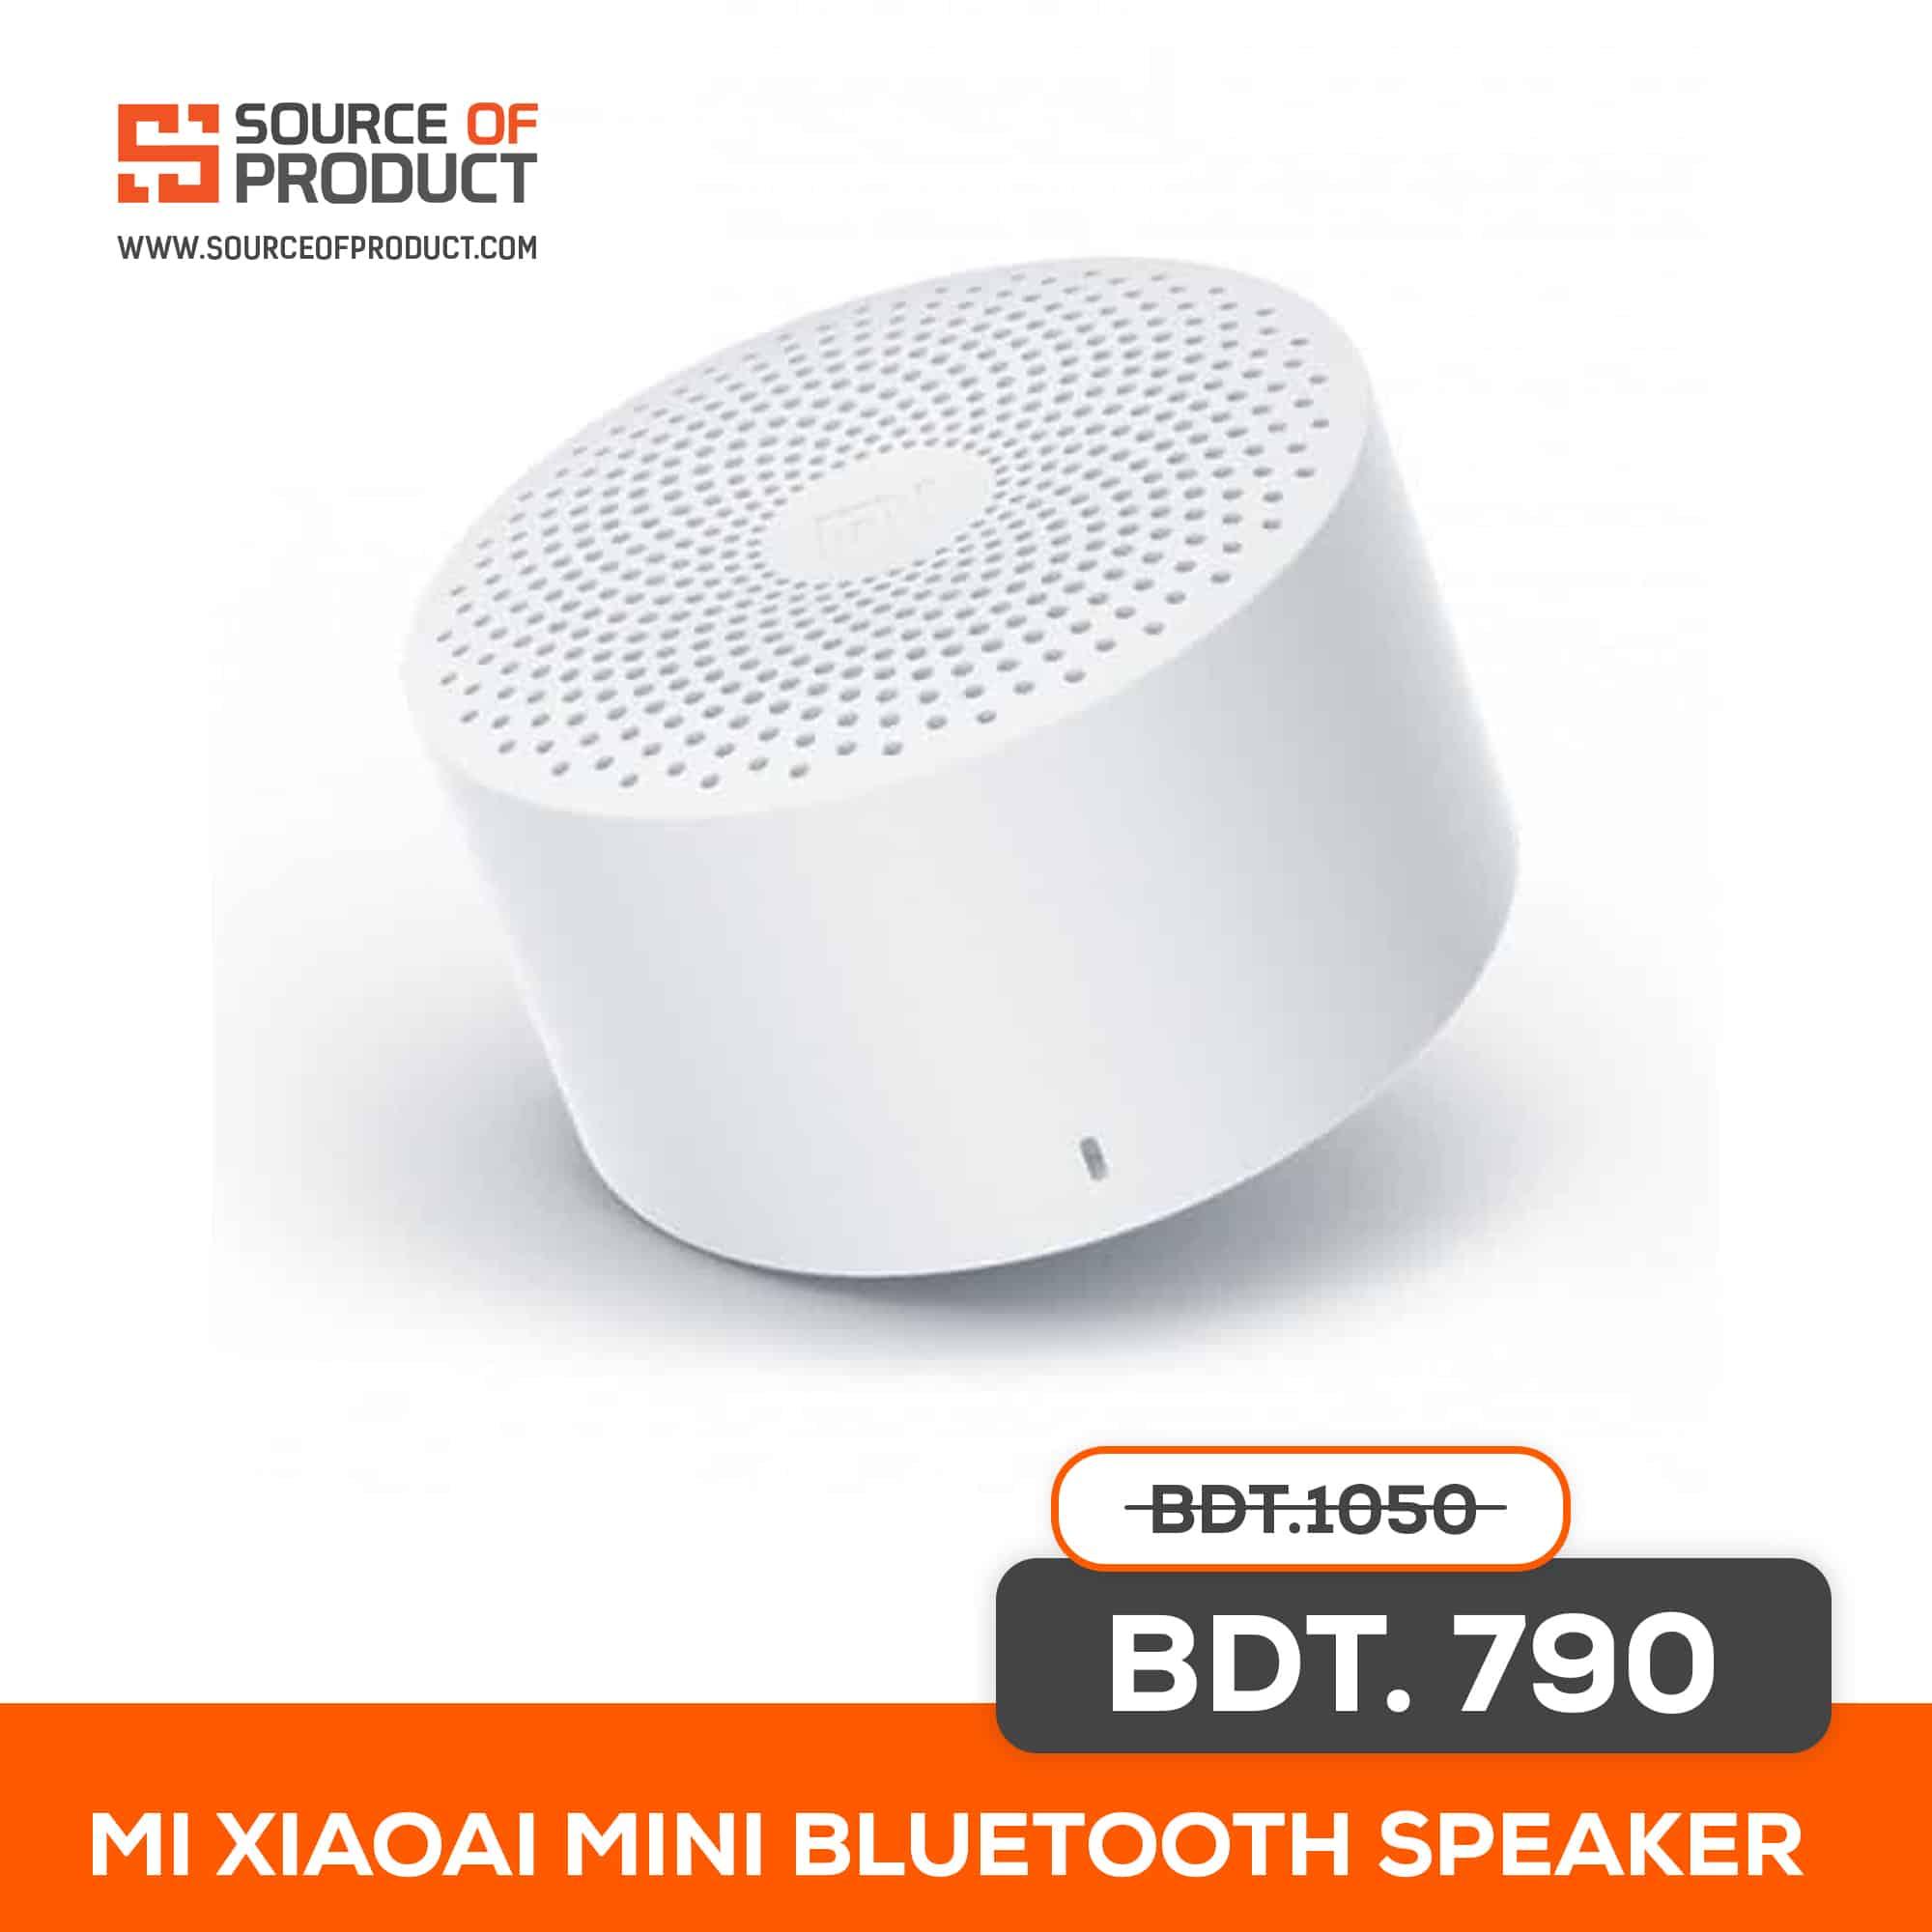 Mi Xiaoai Mini Bluetooth Speaker Price In Bangladesh Source Of Product